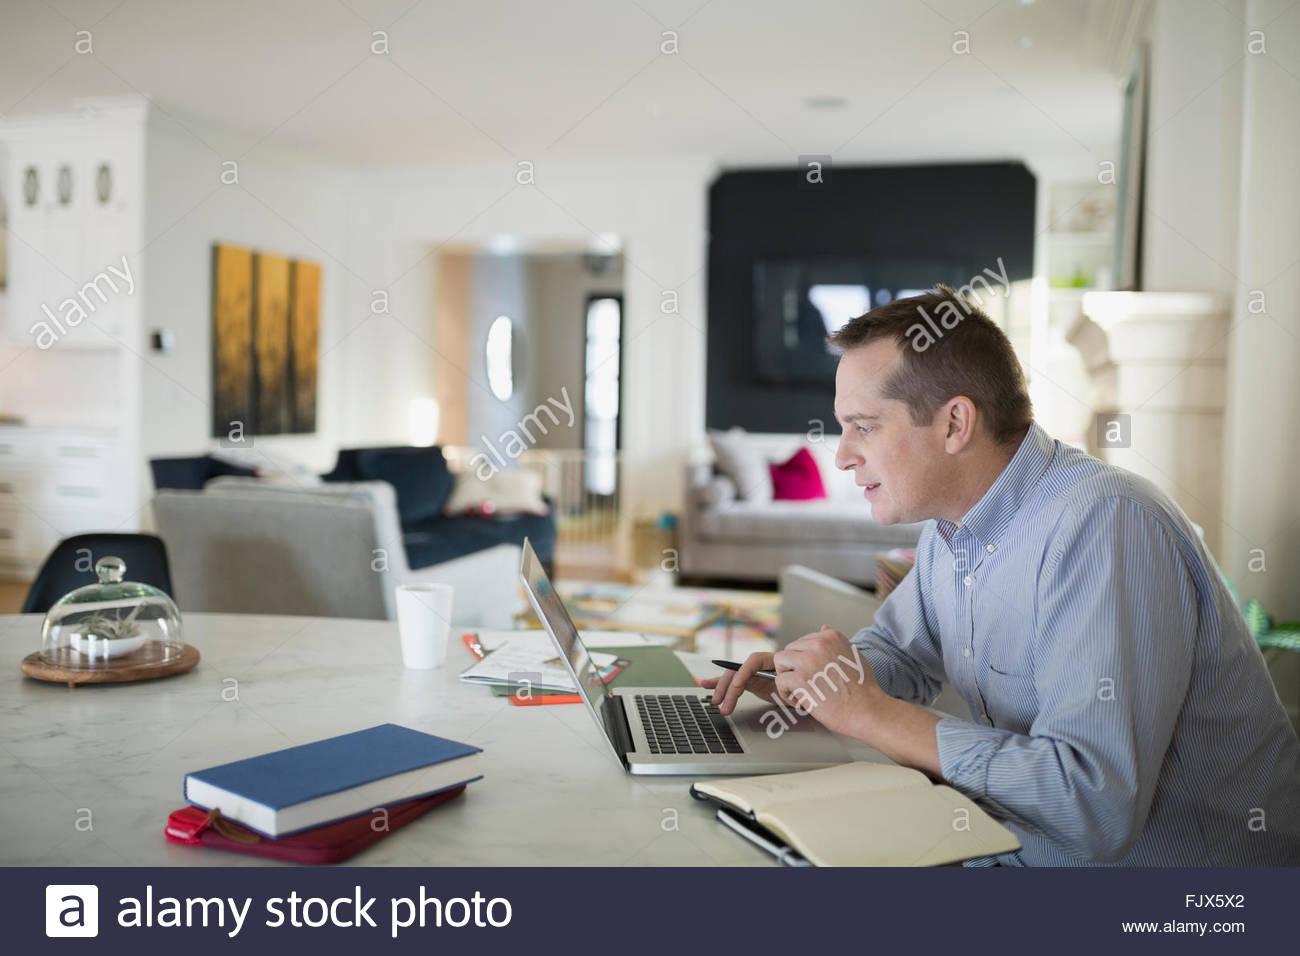 Man working at laptop at kitchen table - Stock Image